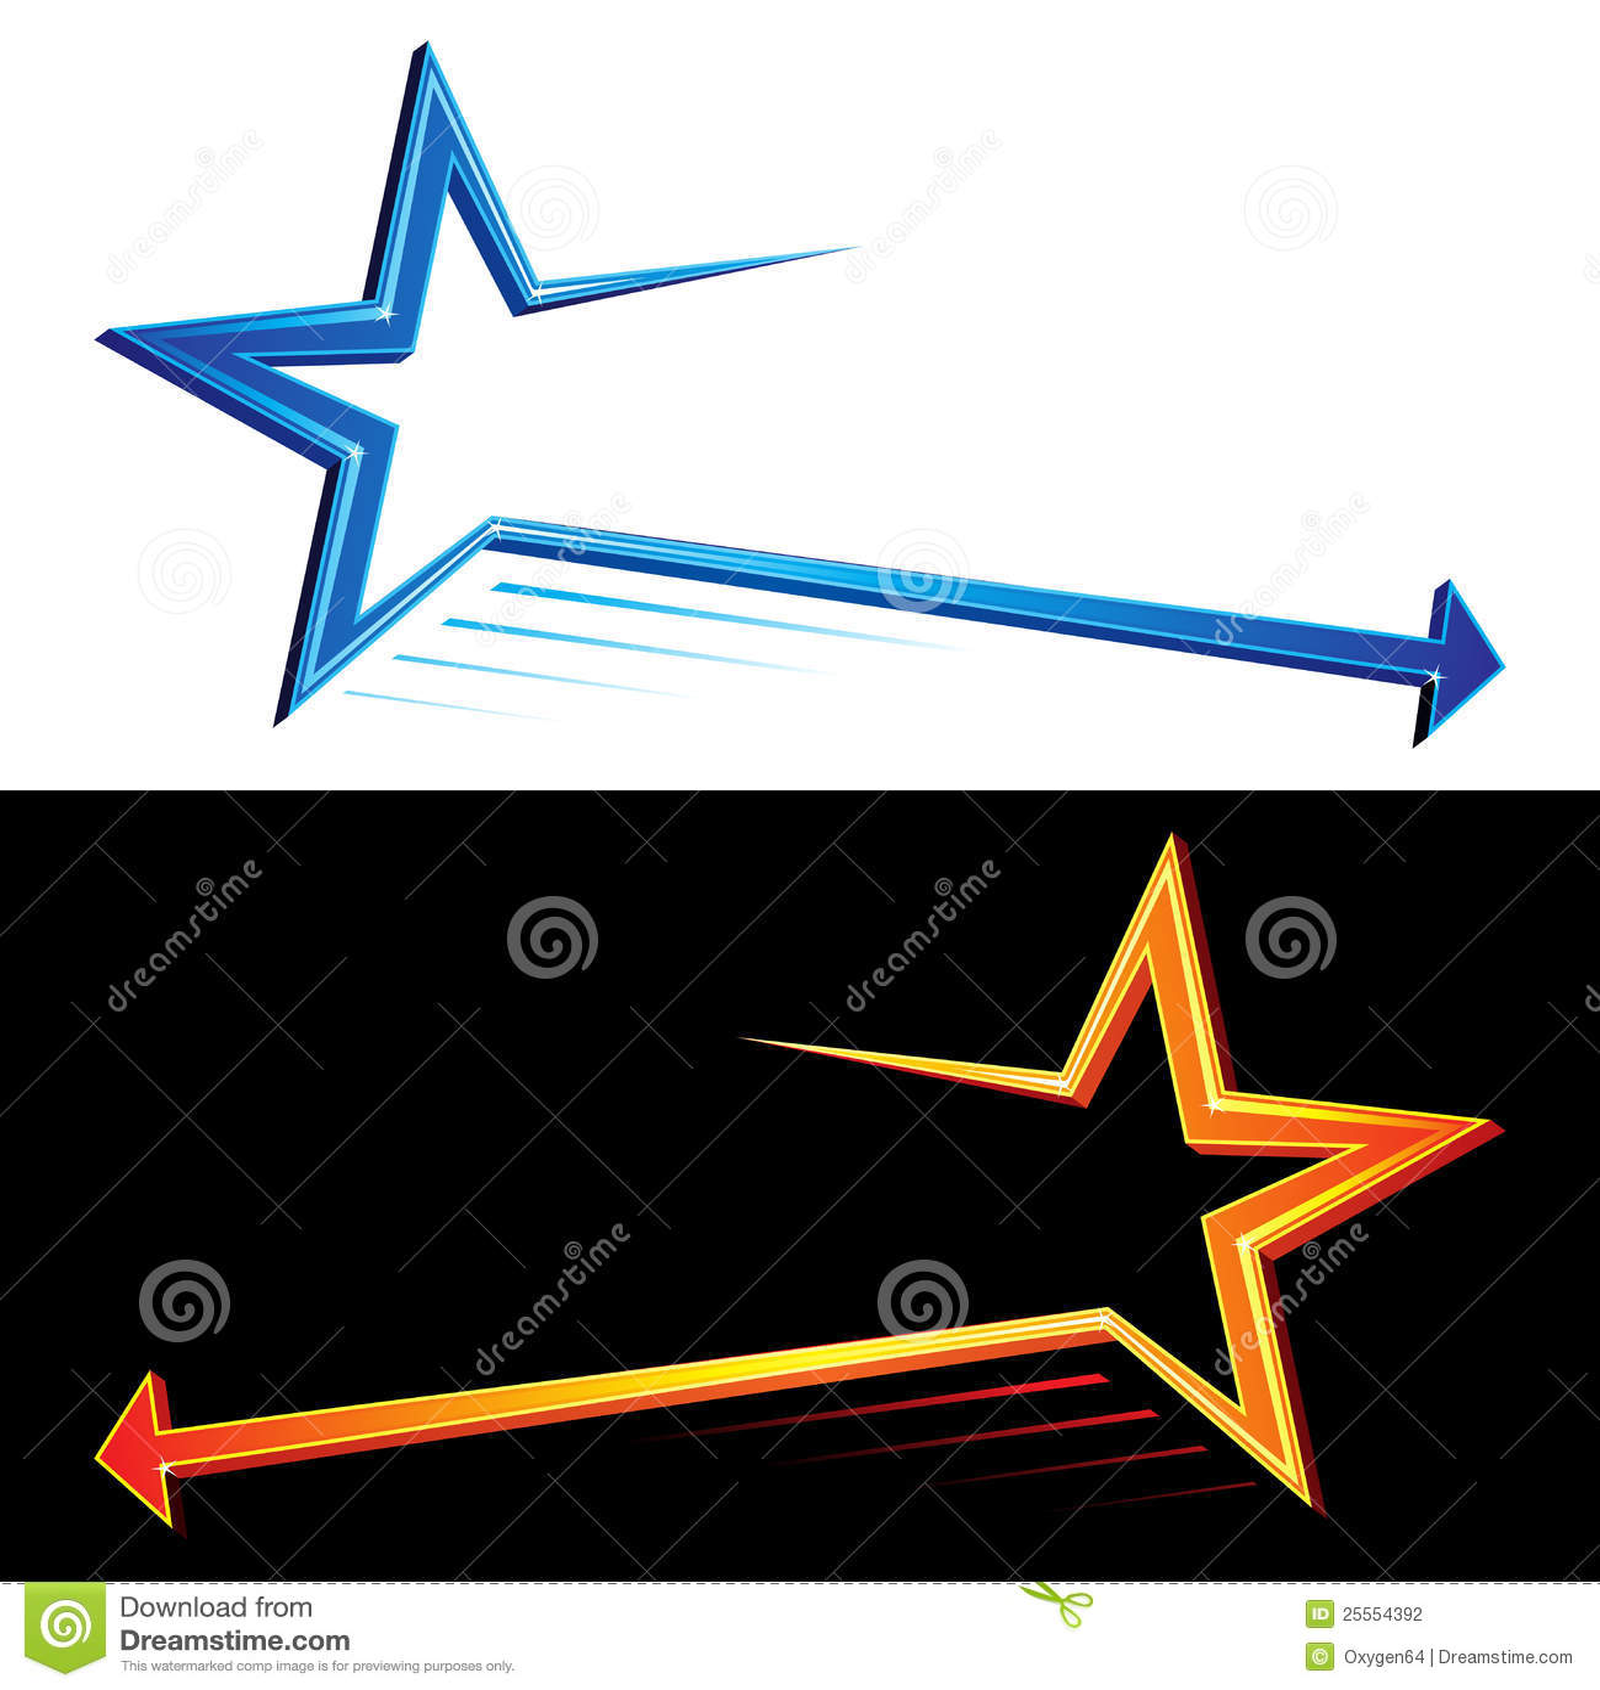 Star Symbols Stock Vector Illustration Of Blue Rays 25554392